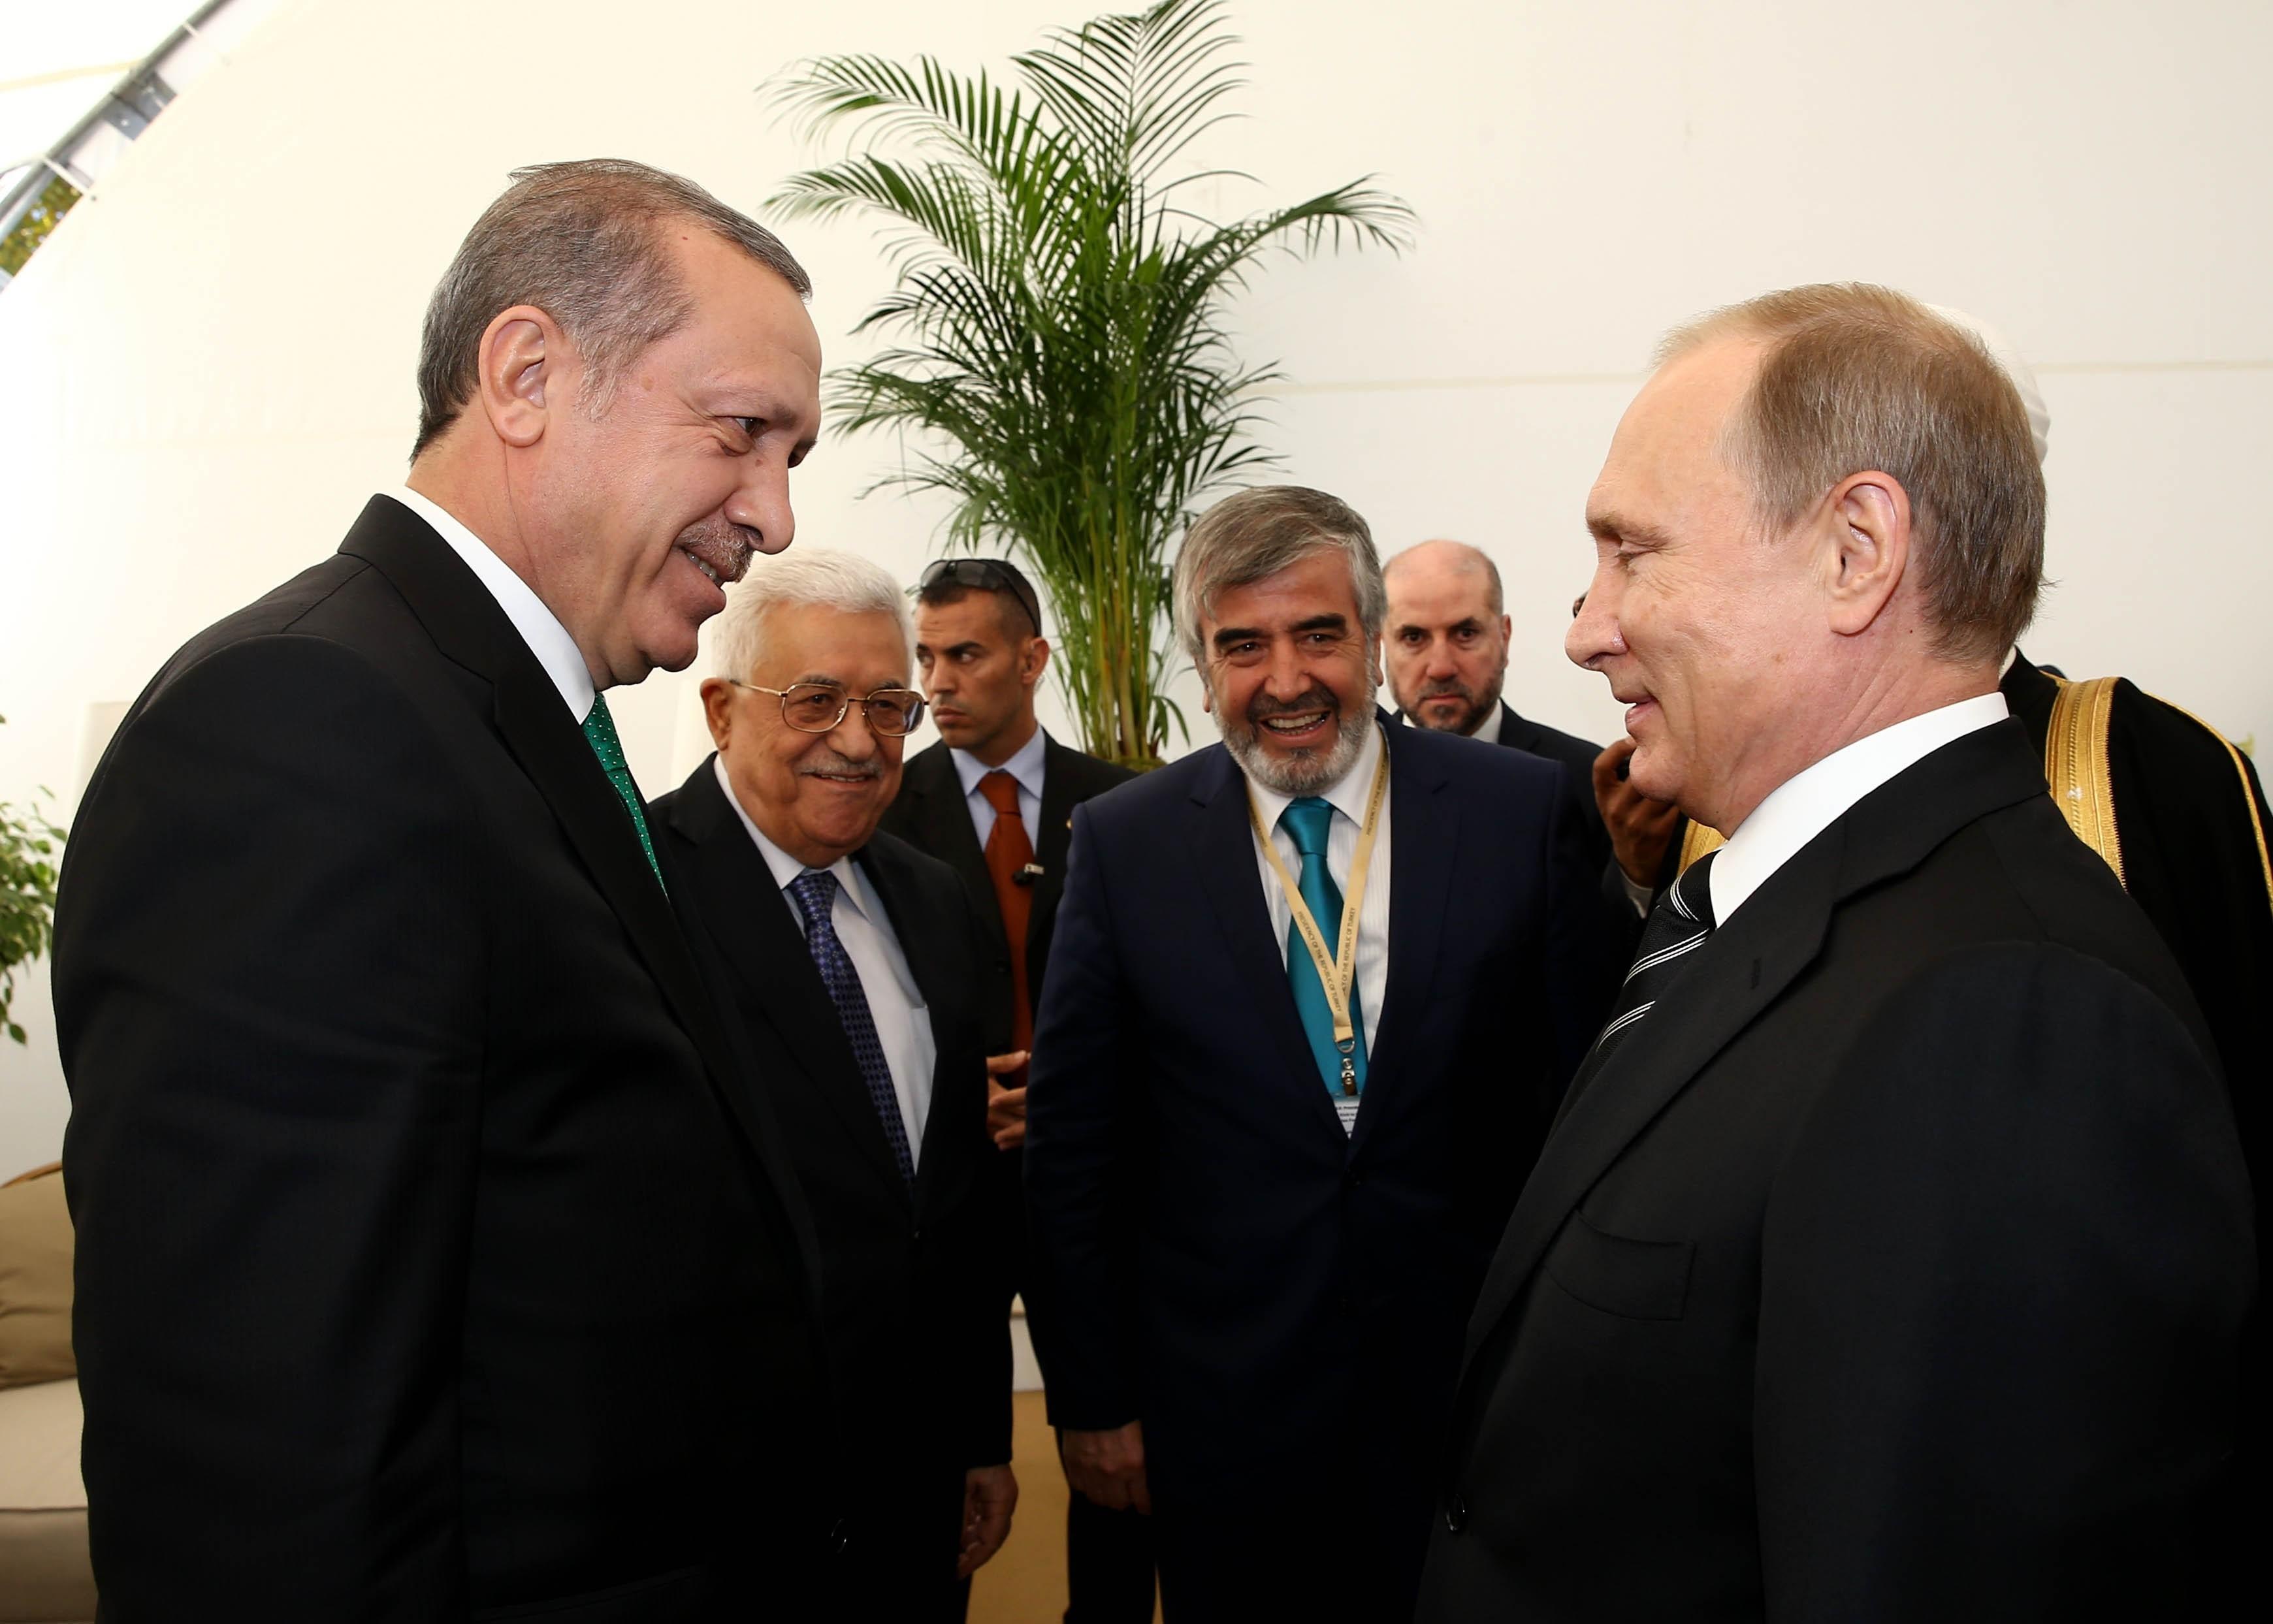 Turkey's President Recep Tayyip Erdogan in Moscow